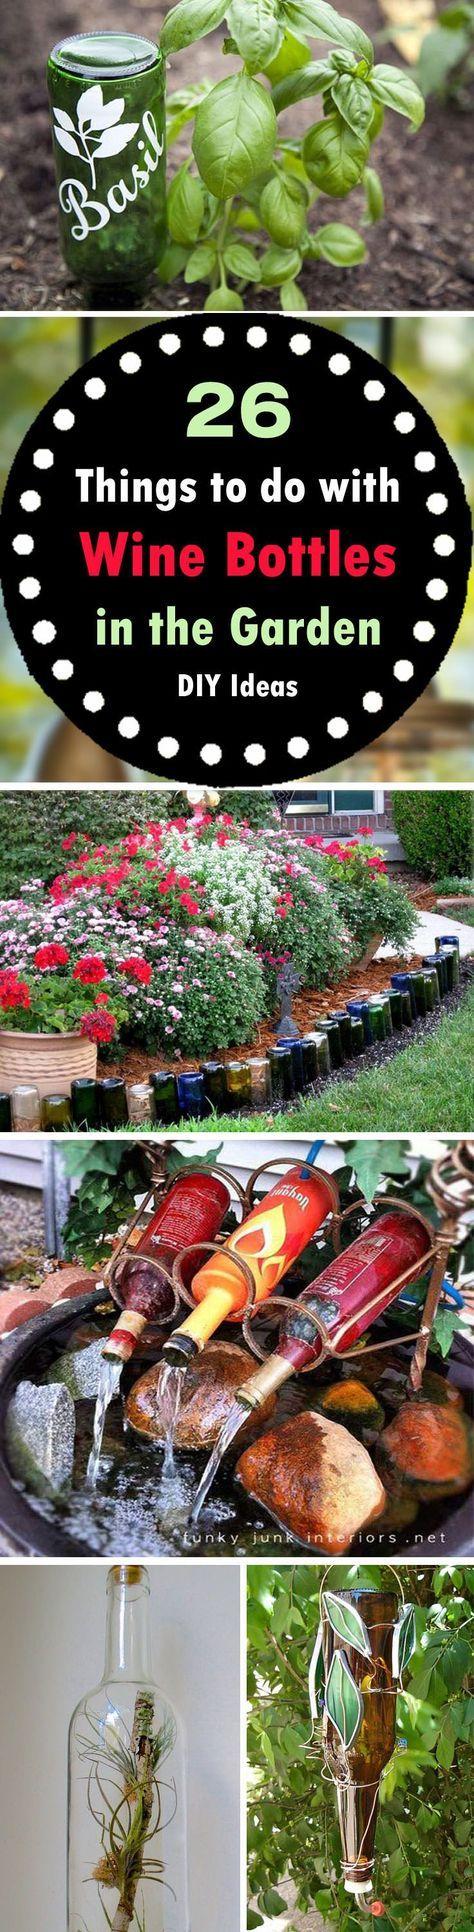 Wine bottle crafts outdoor - 25 Best Ideas About Wine Bottle Garden On Pinterest Recycled Bottle Crafts Wine Bottle Art And Cutting Wine Bottles